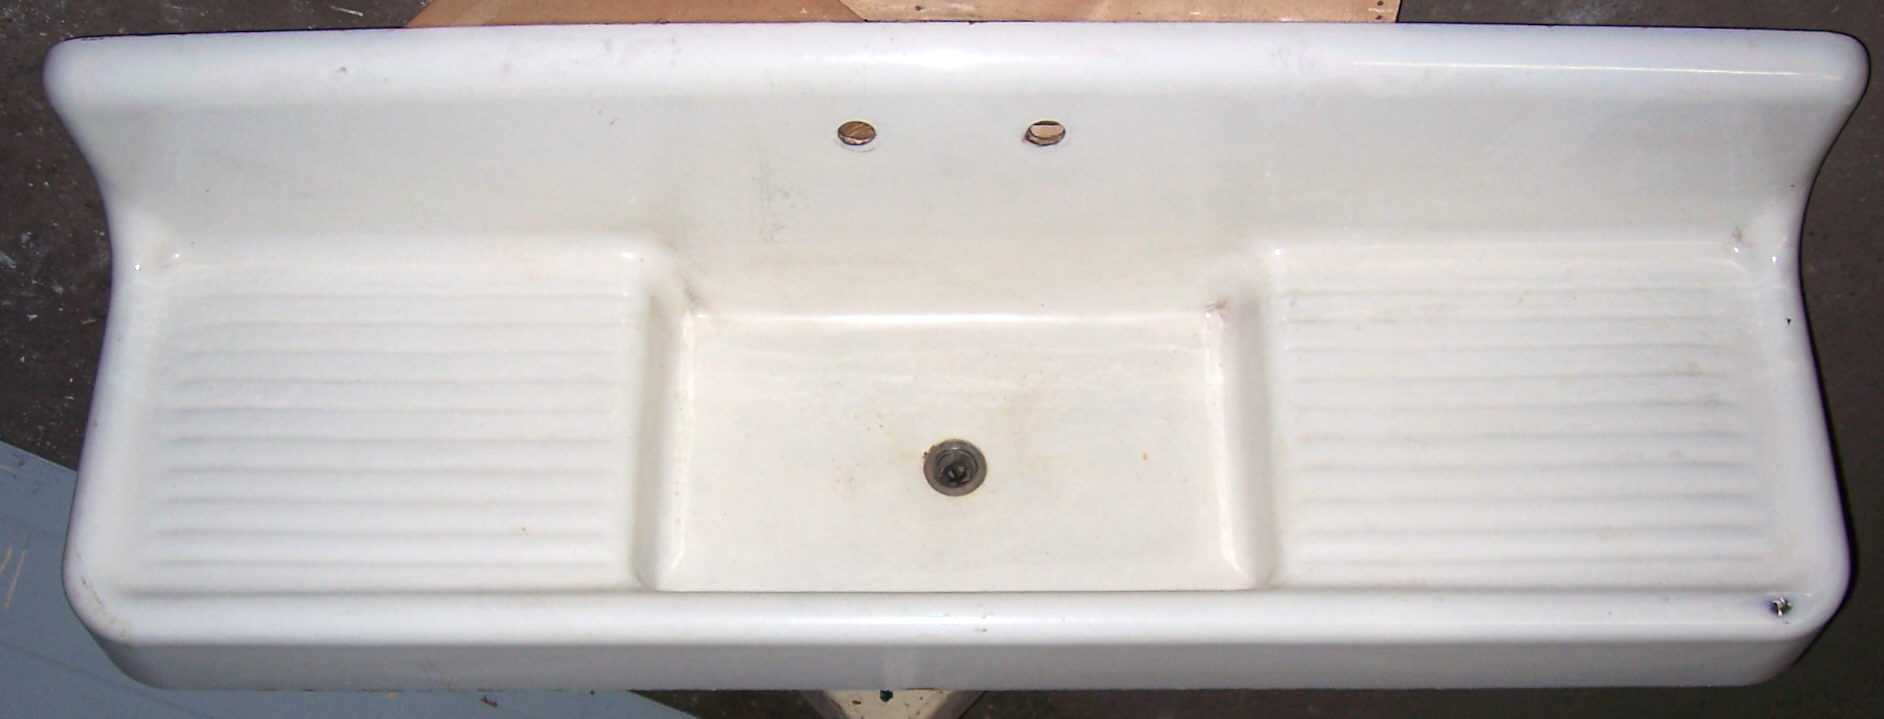 Kitchen Sinks VintageBathroom